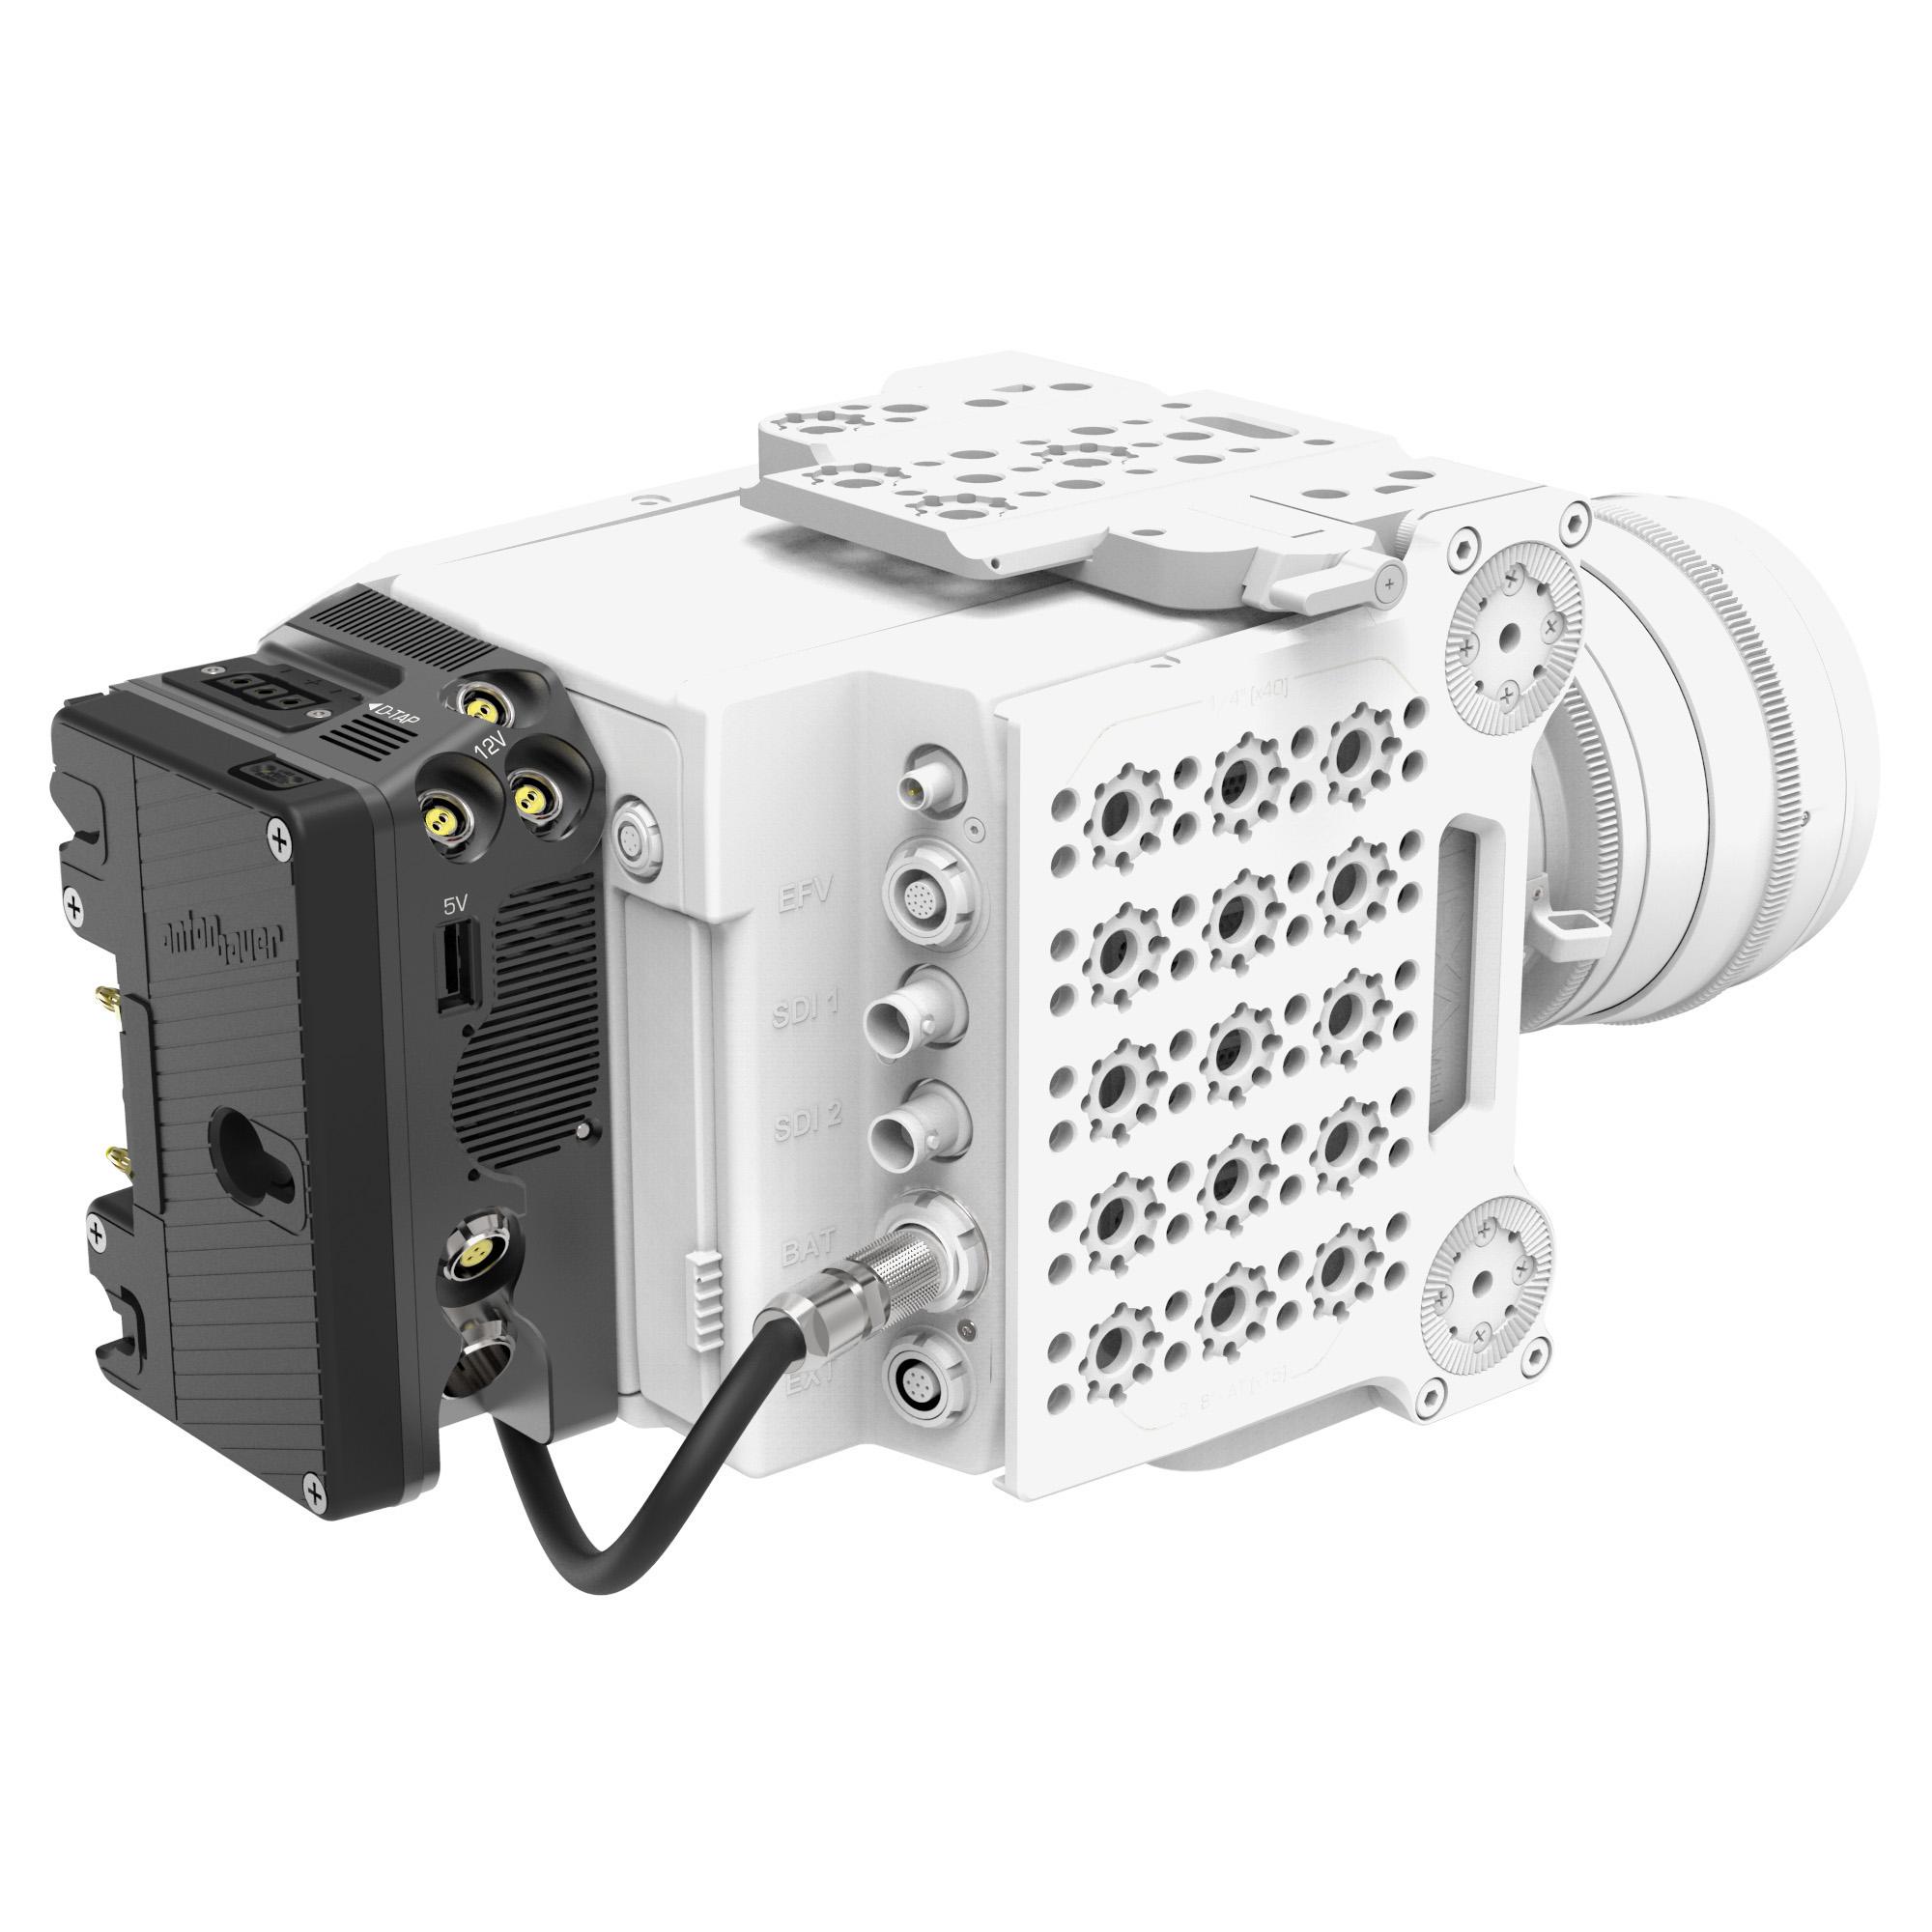 B4001.1001 Alexa Mini Power Distribution Module Gold Mount 4 1